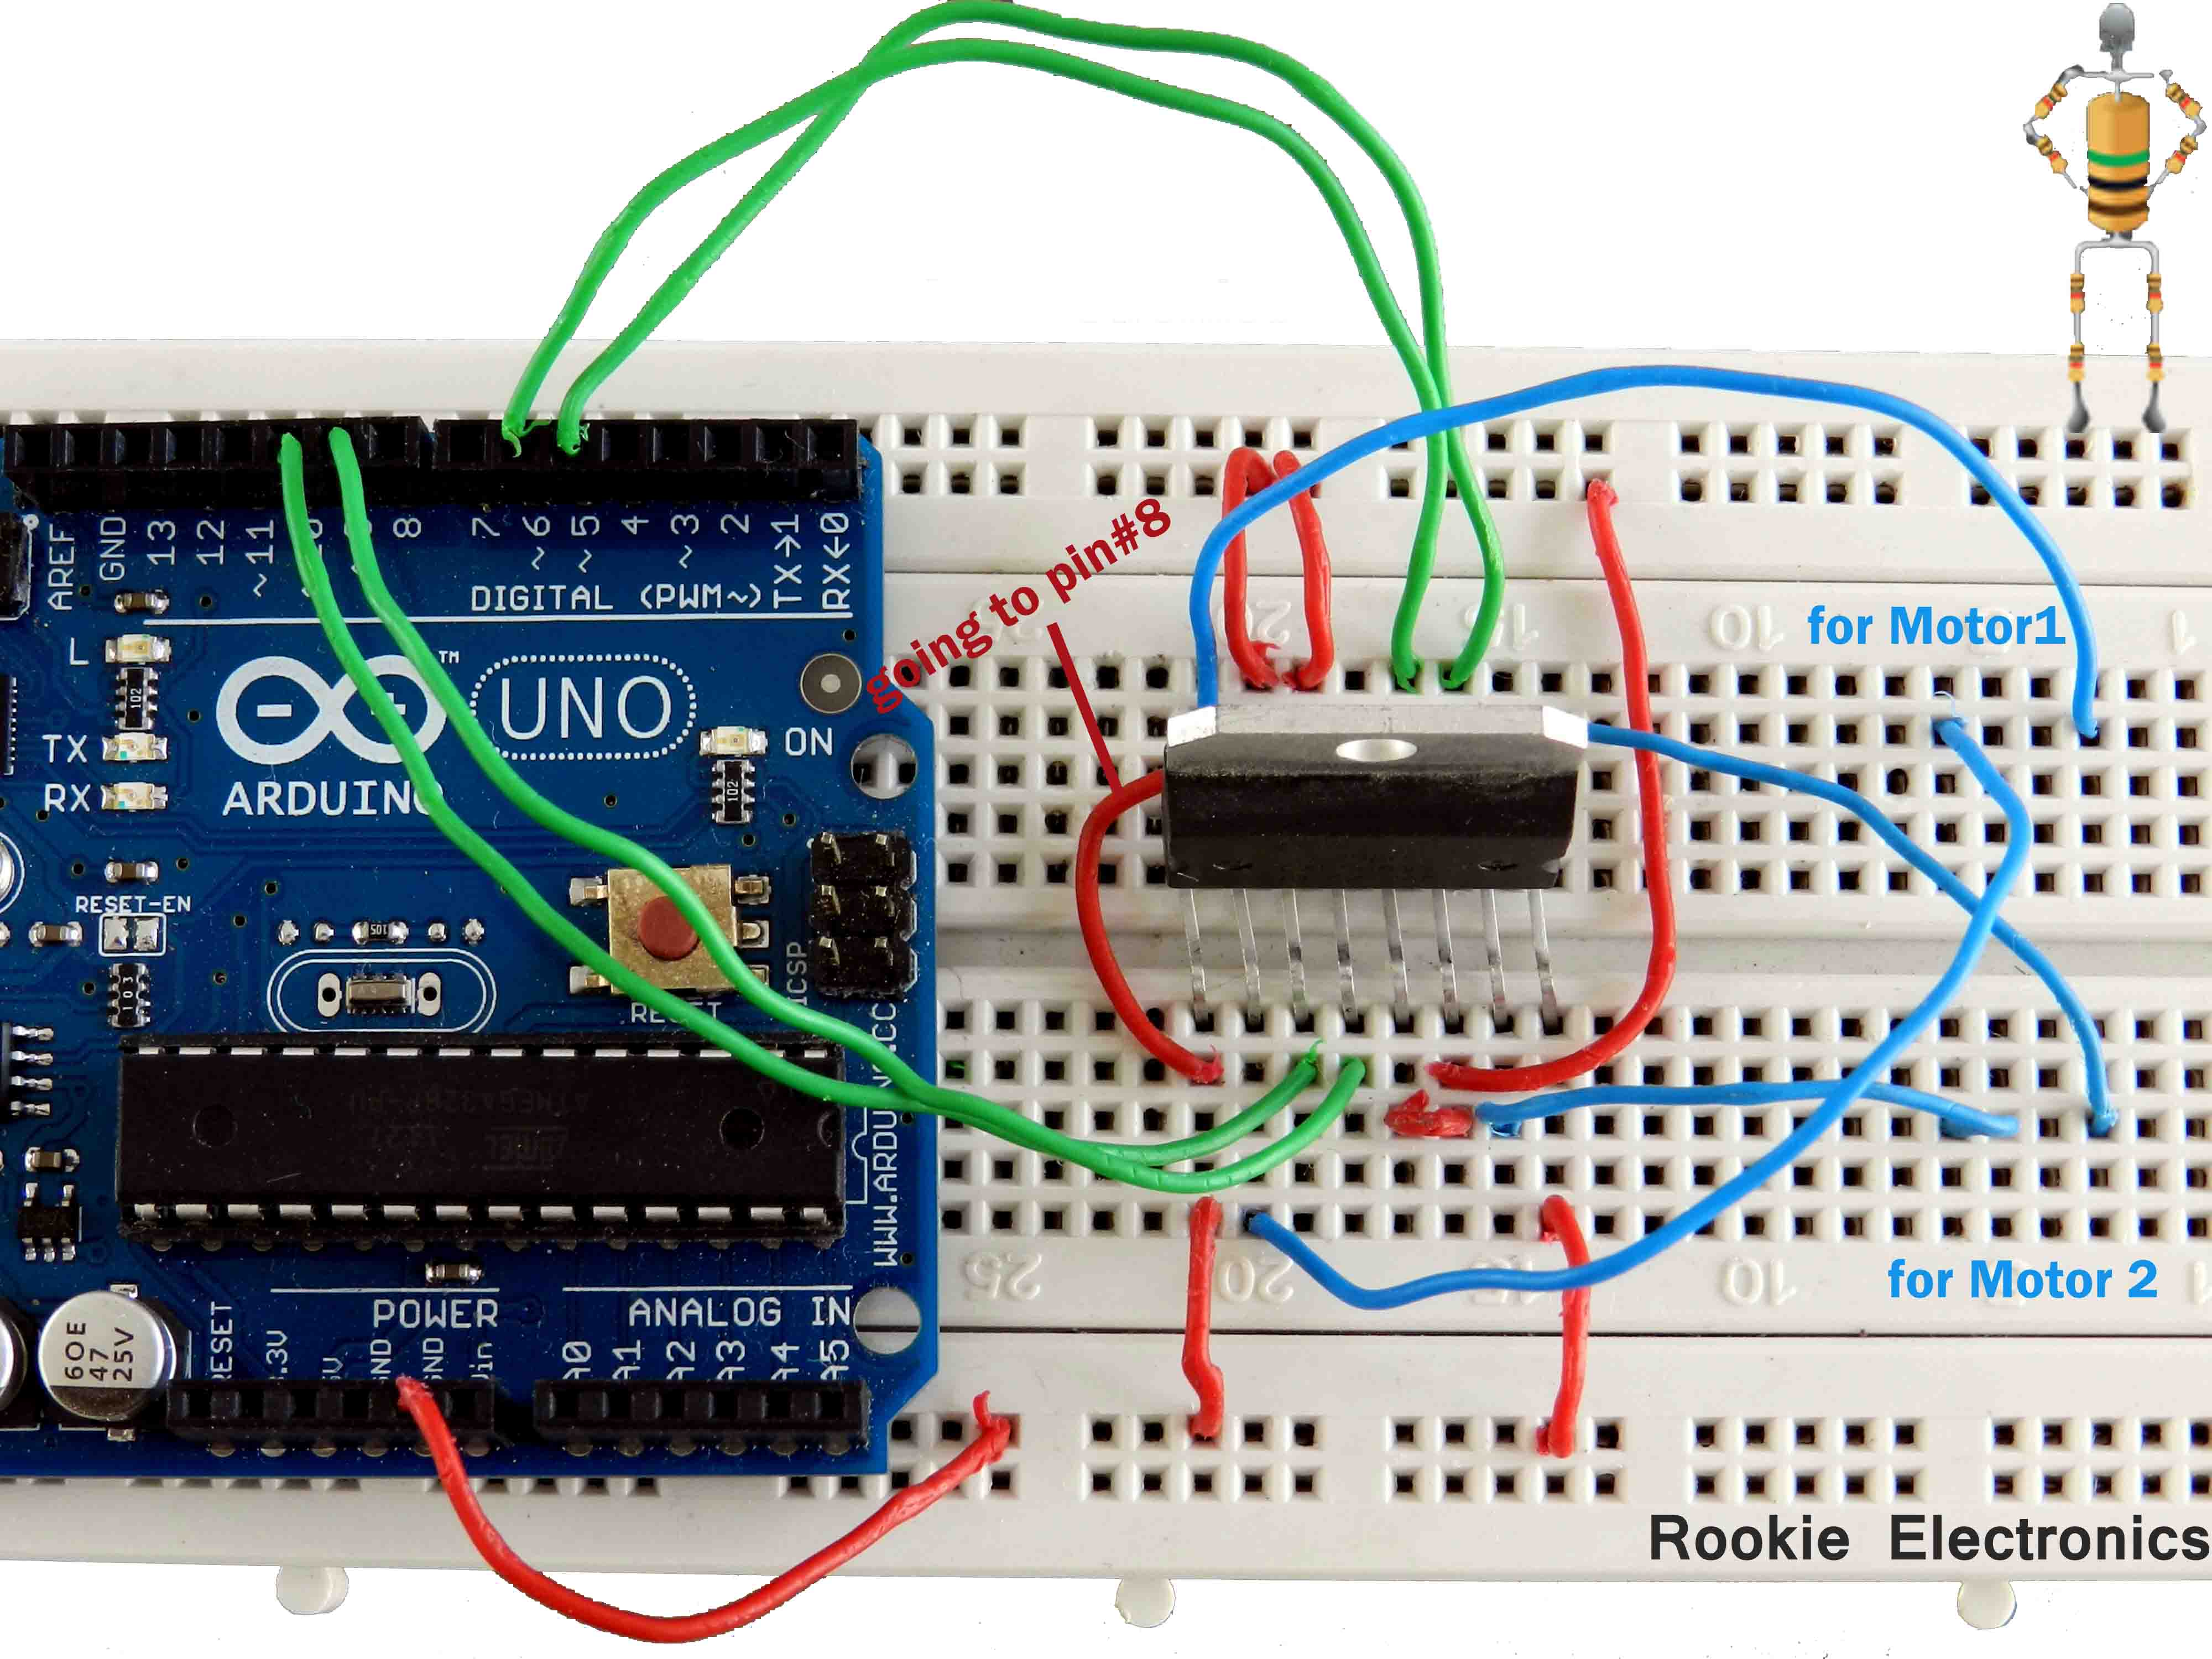 l298 h bridge circuit diagram wire frame diagrams basic programmed robot rookie electronics